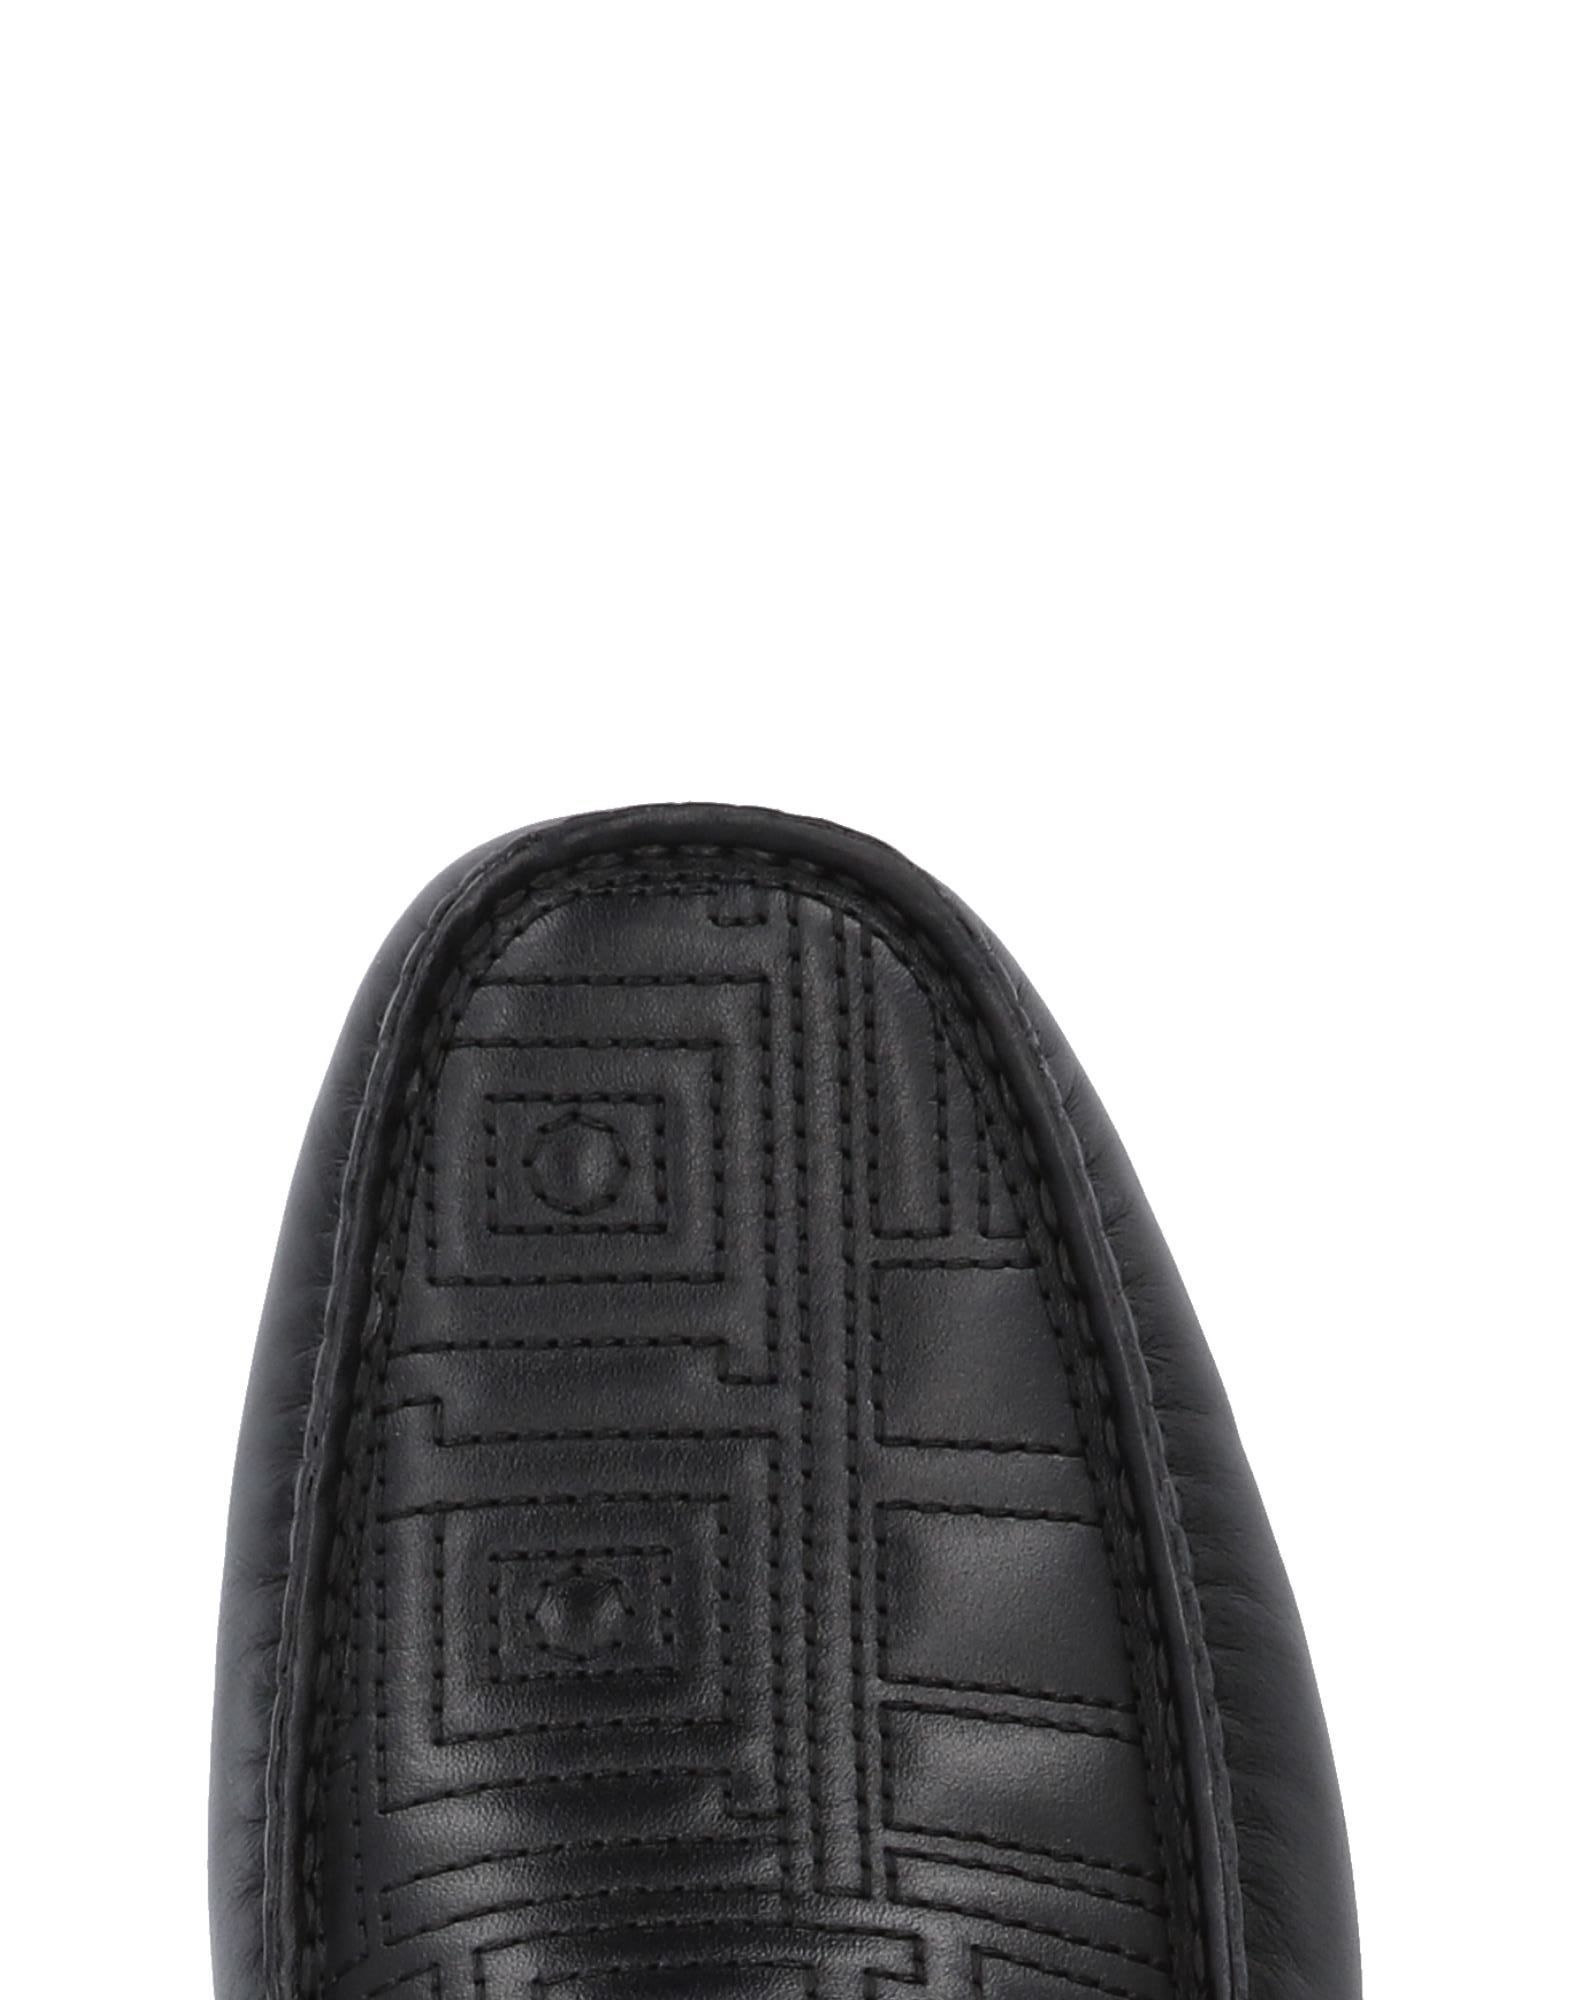 Versace Collection Gute Mokassins Herren  11463345RD Gute Collection Qualität beliebte Schuhe 5671fb